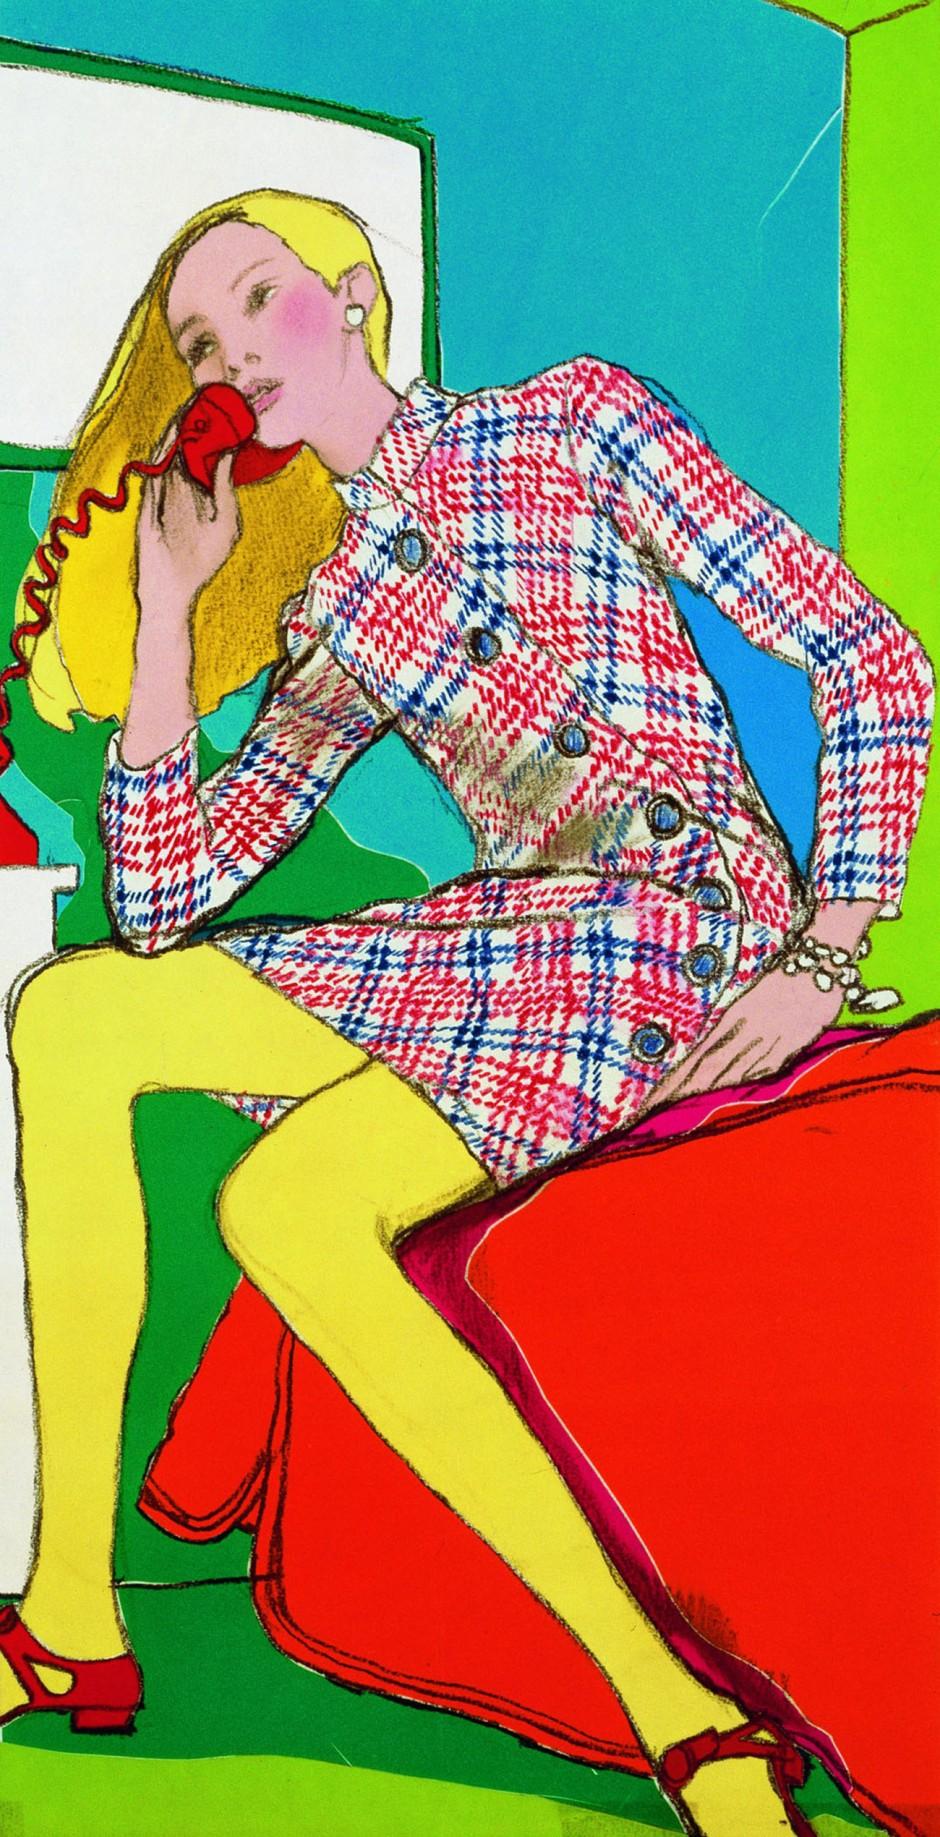 Antonio, At Home, 1967, veröffentlicht in The New York Times Magazine, Mixed Media, 56 x 22 cm